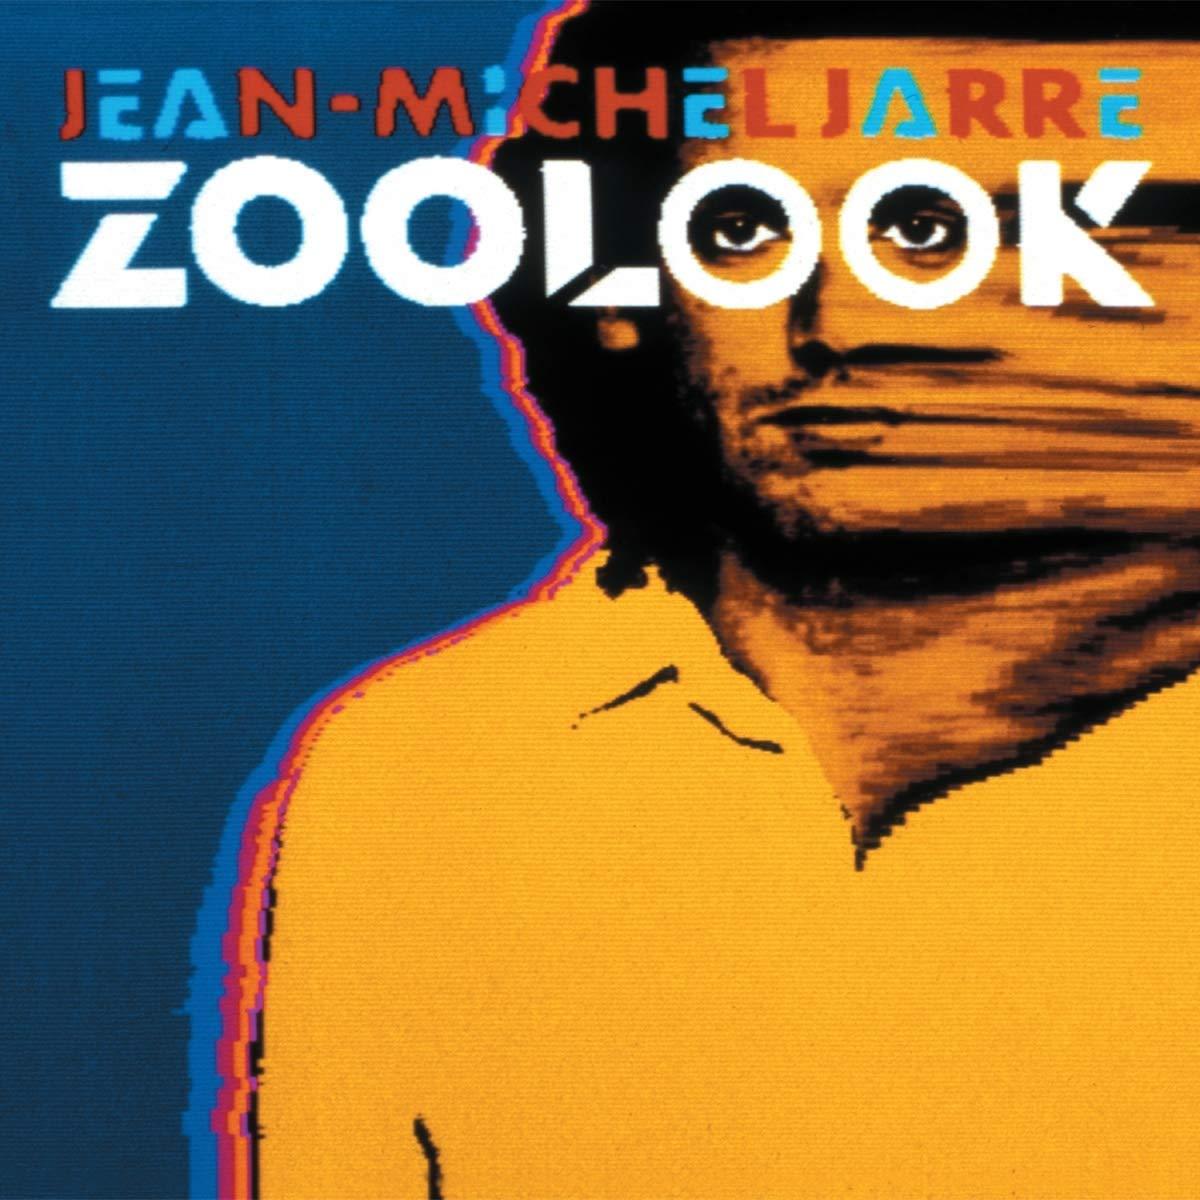 Zoolook - Vinyl